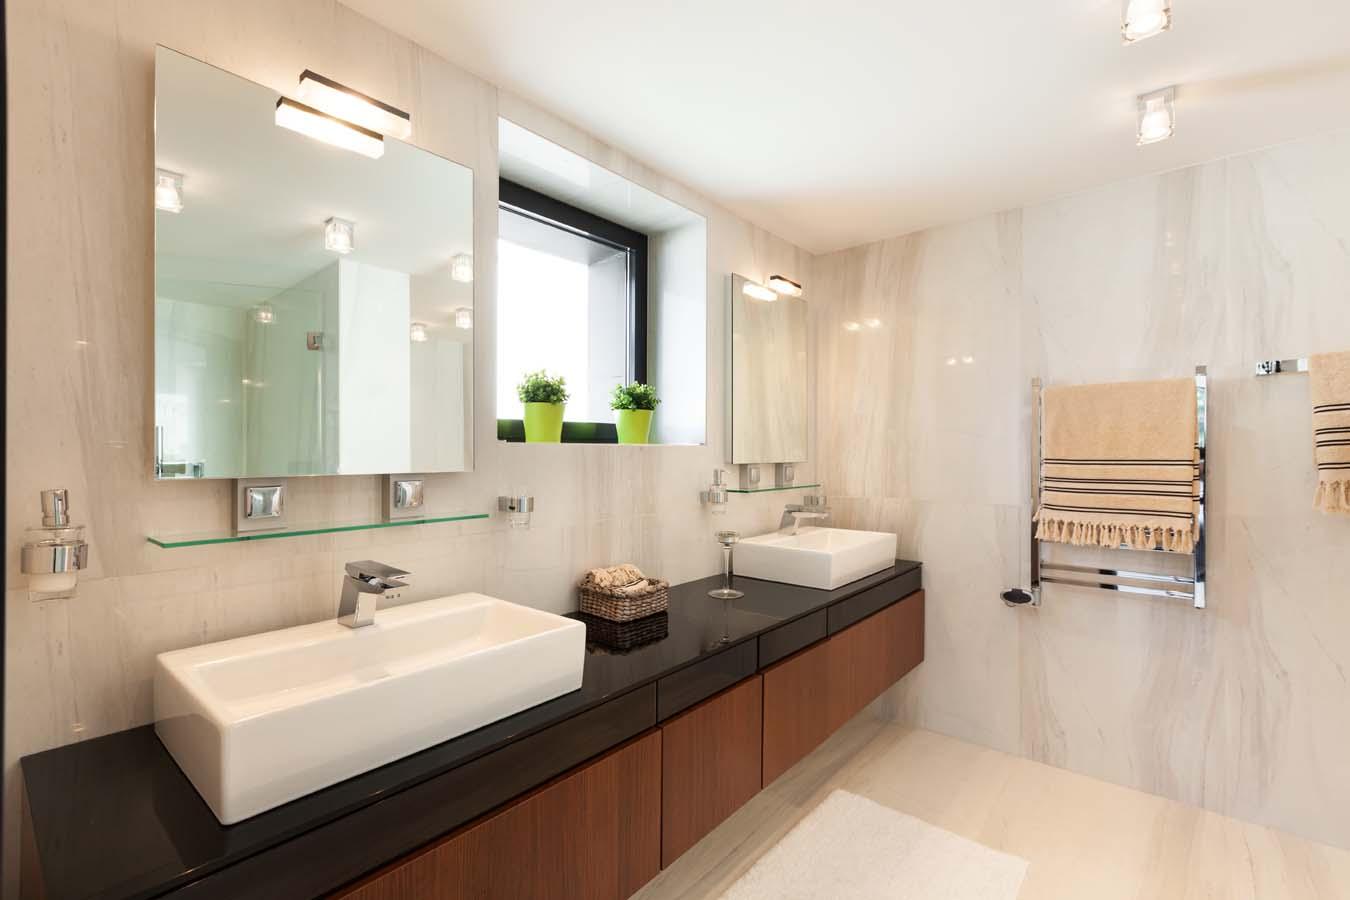 Vanity Mirror TV   Order Vanishing Television For Your Bathroom